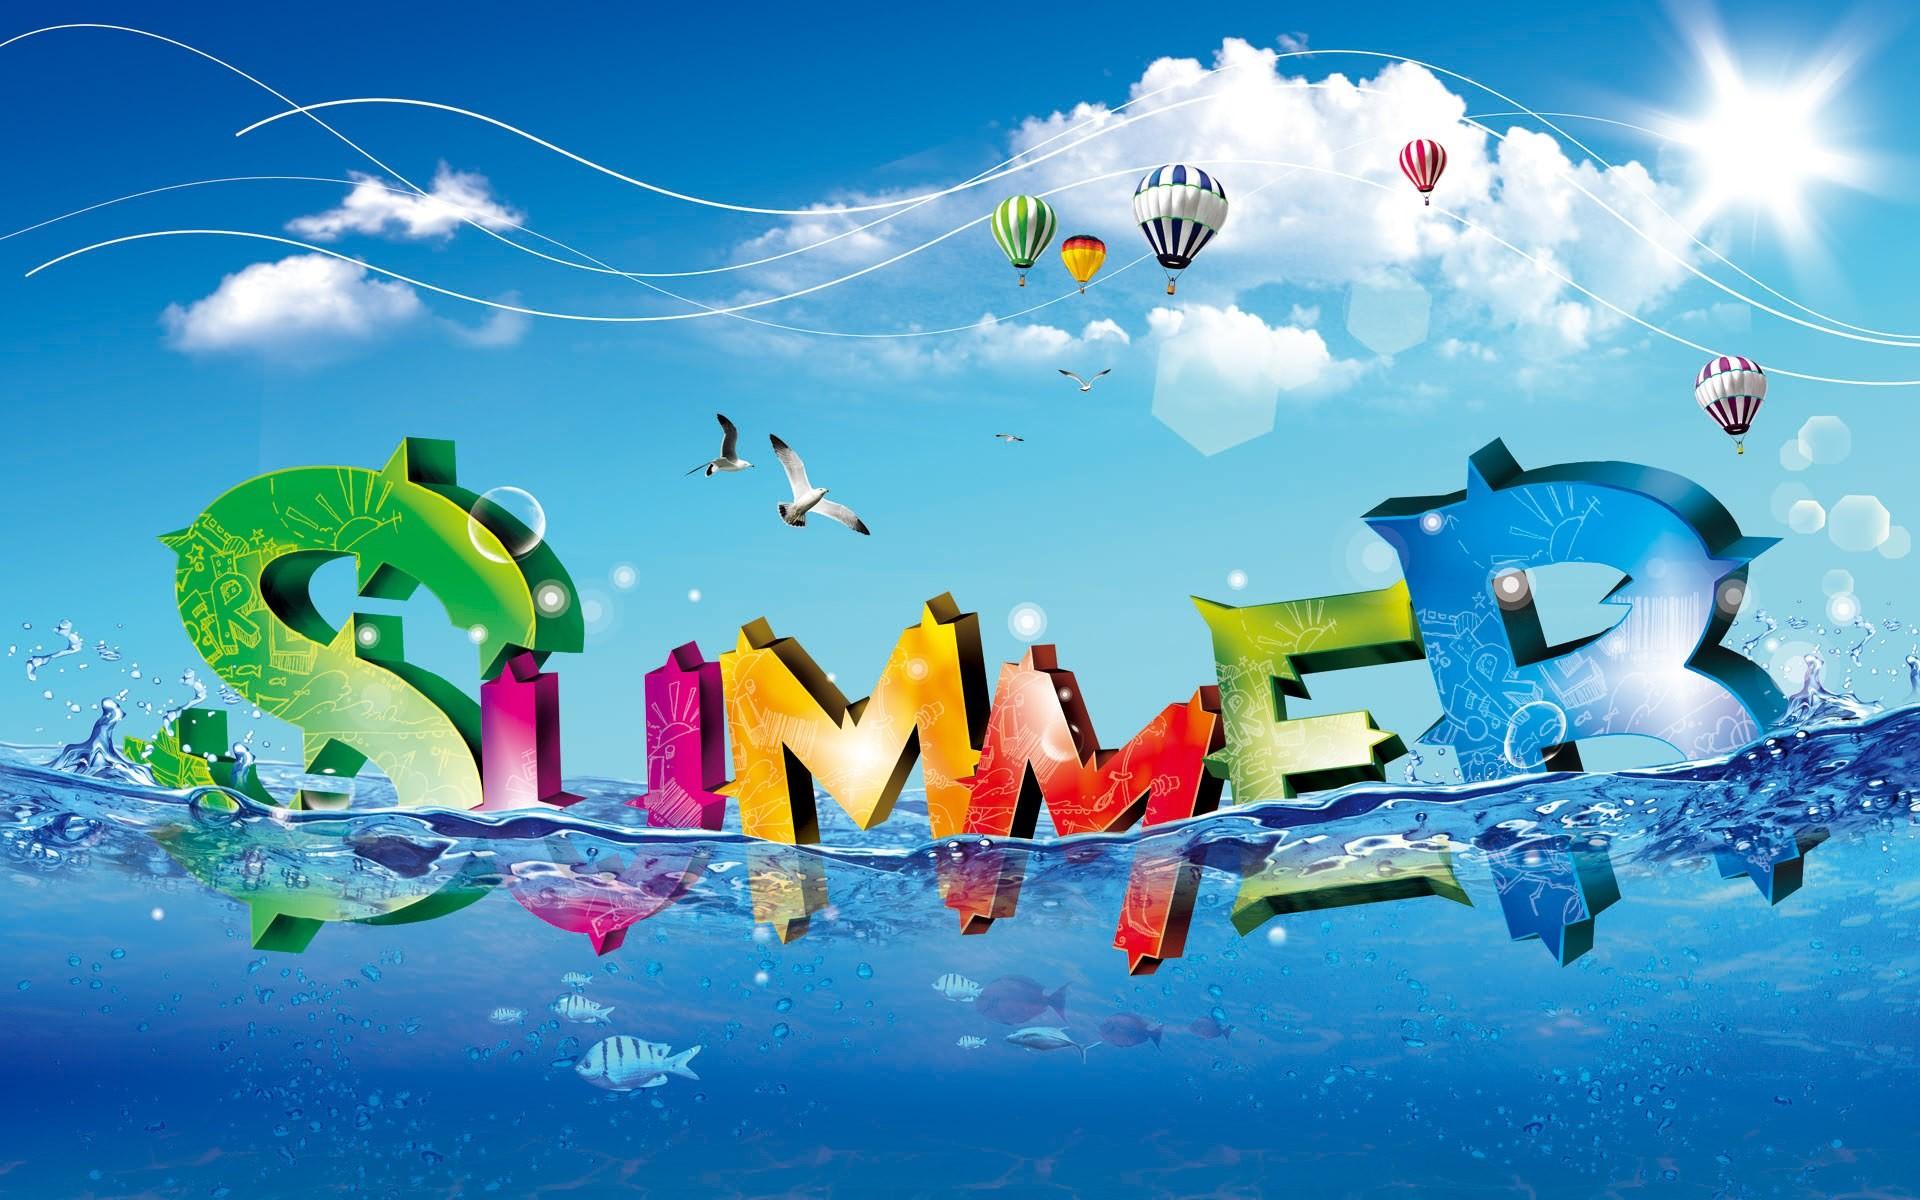 Summer Wallpapers for Interior Design Ideas Wide Summer Wallpaper Wall  Murals Interior Ideas – GO WALLPAPER